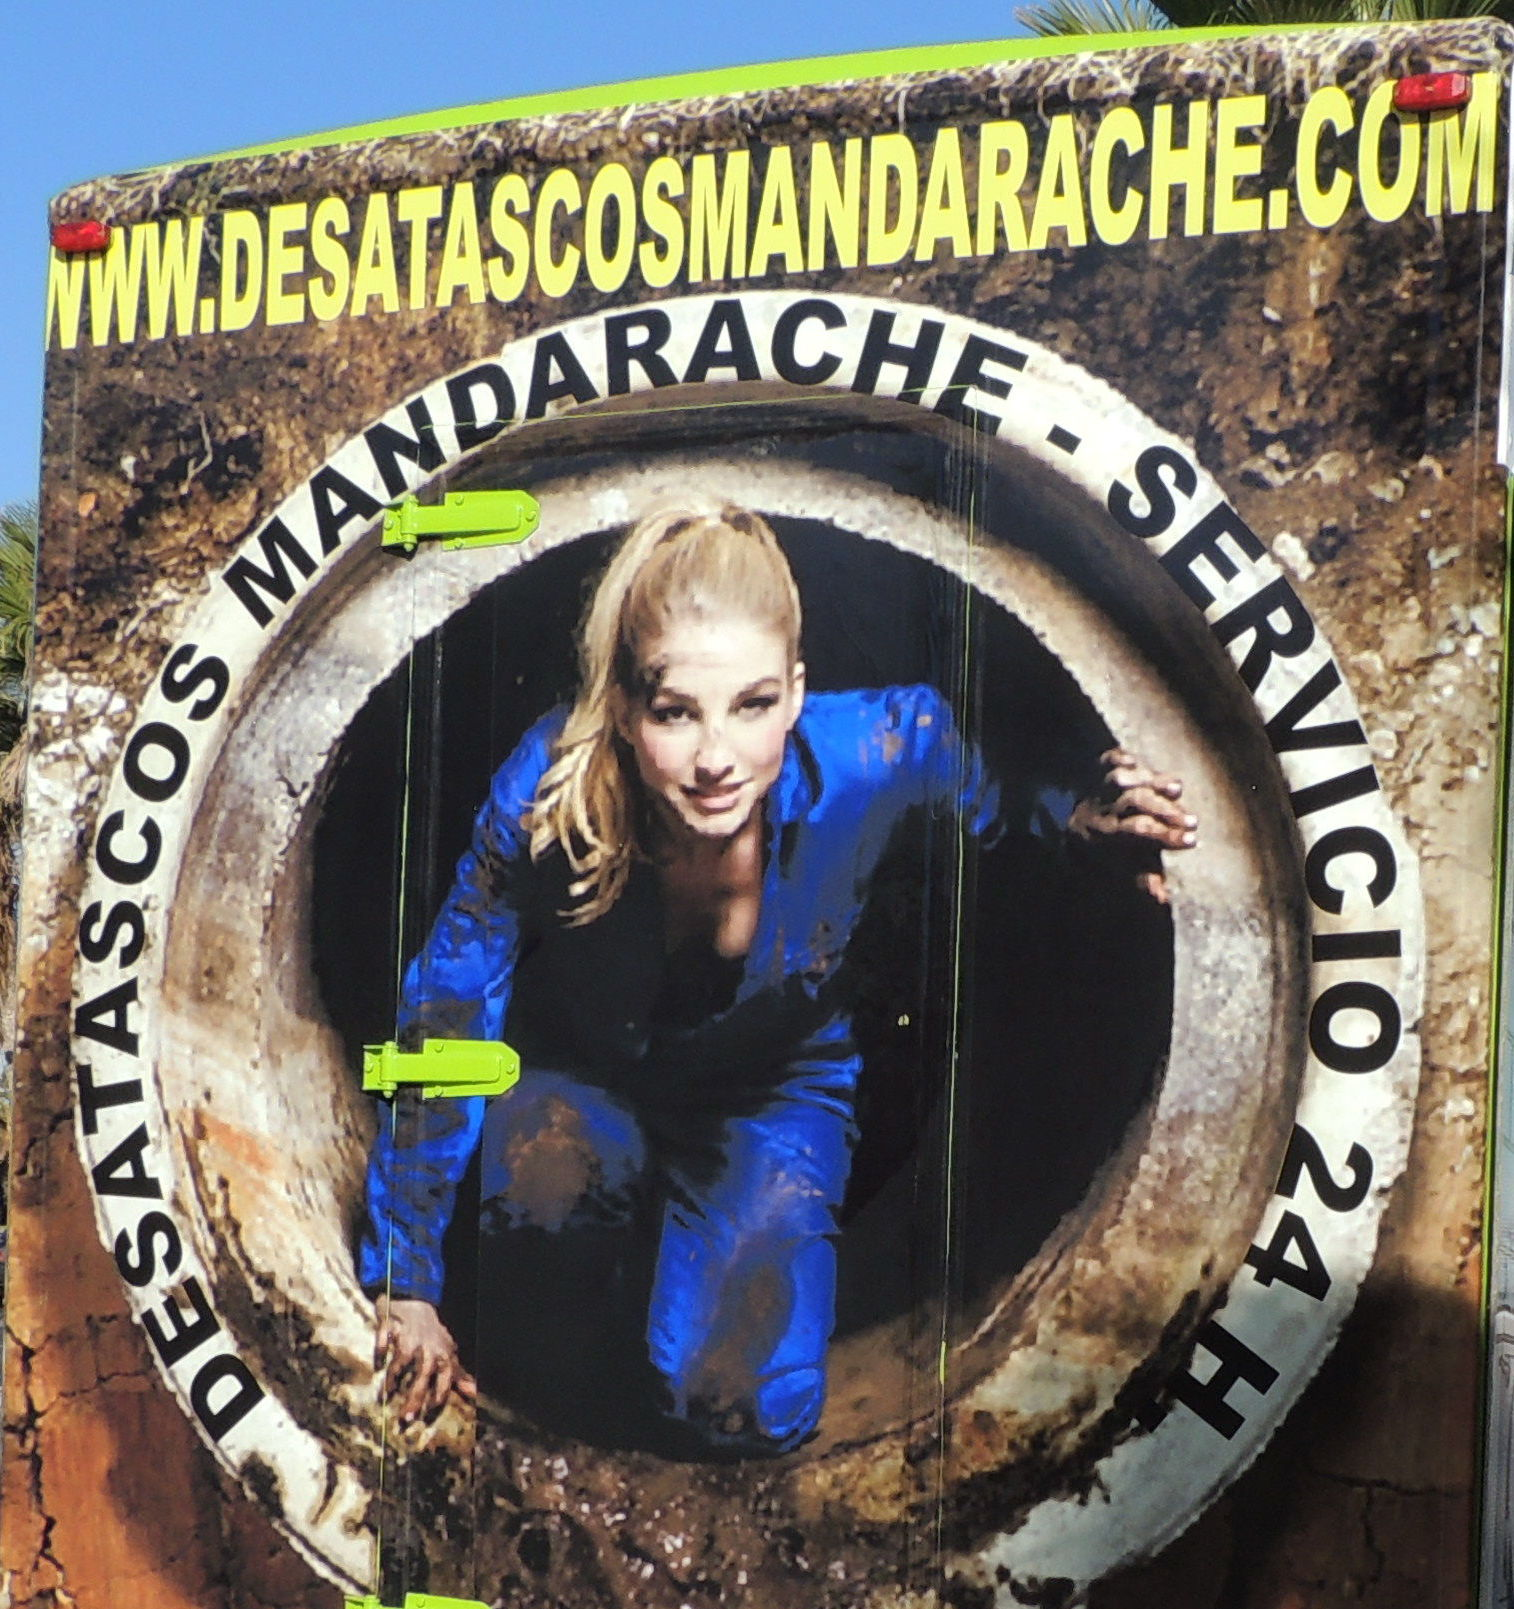 Desatascos urgentes Murcia, Desatascos urgentes Cartagena, Desatascos urgenes Torrevieja, Vaciado fosas septicas Murcia, vaciado fosas septicas Torrevieja, Desatascos Mandarache Murcia